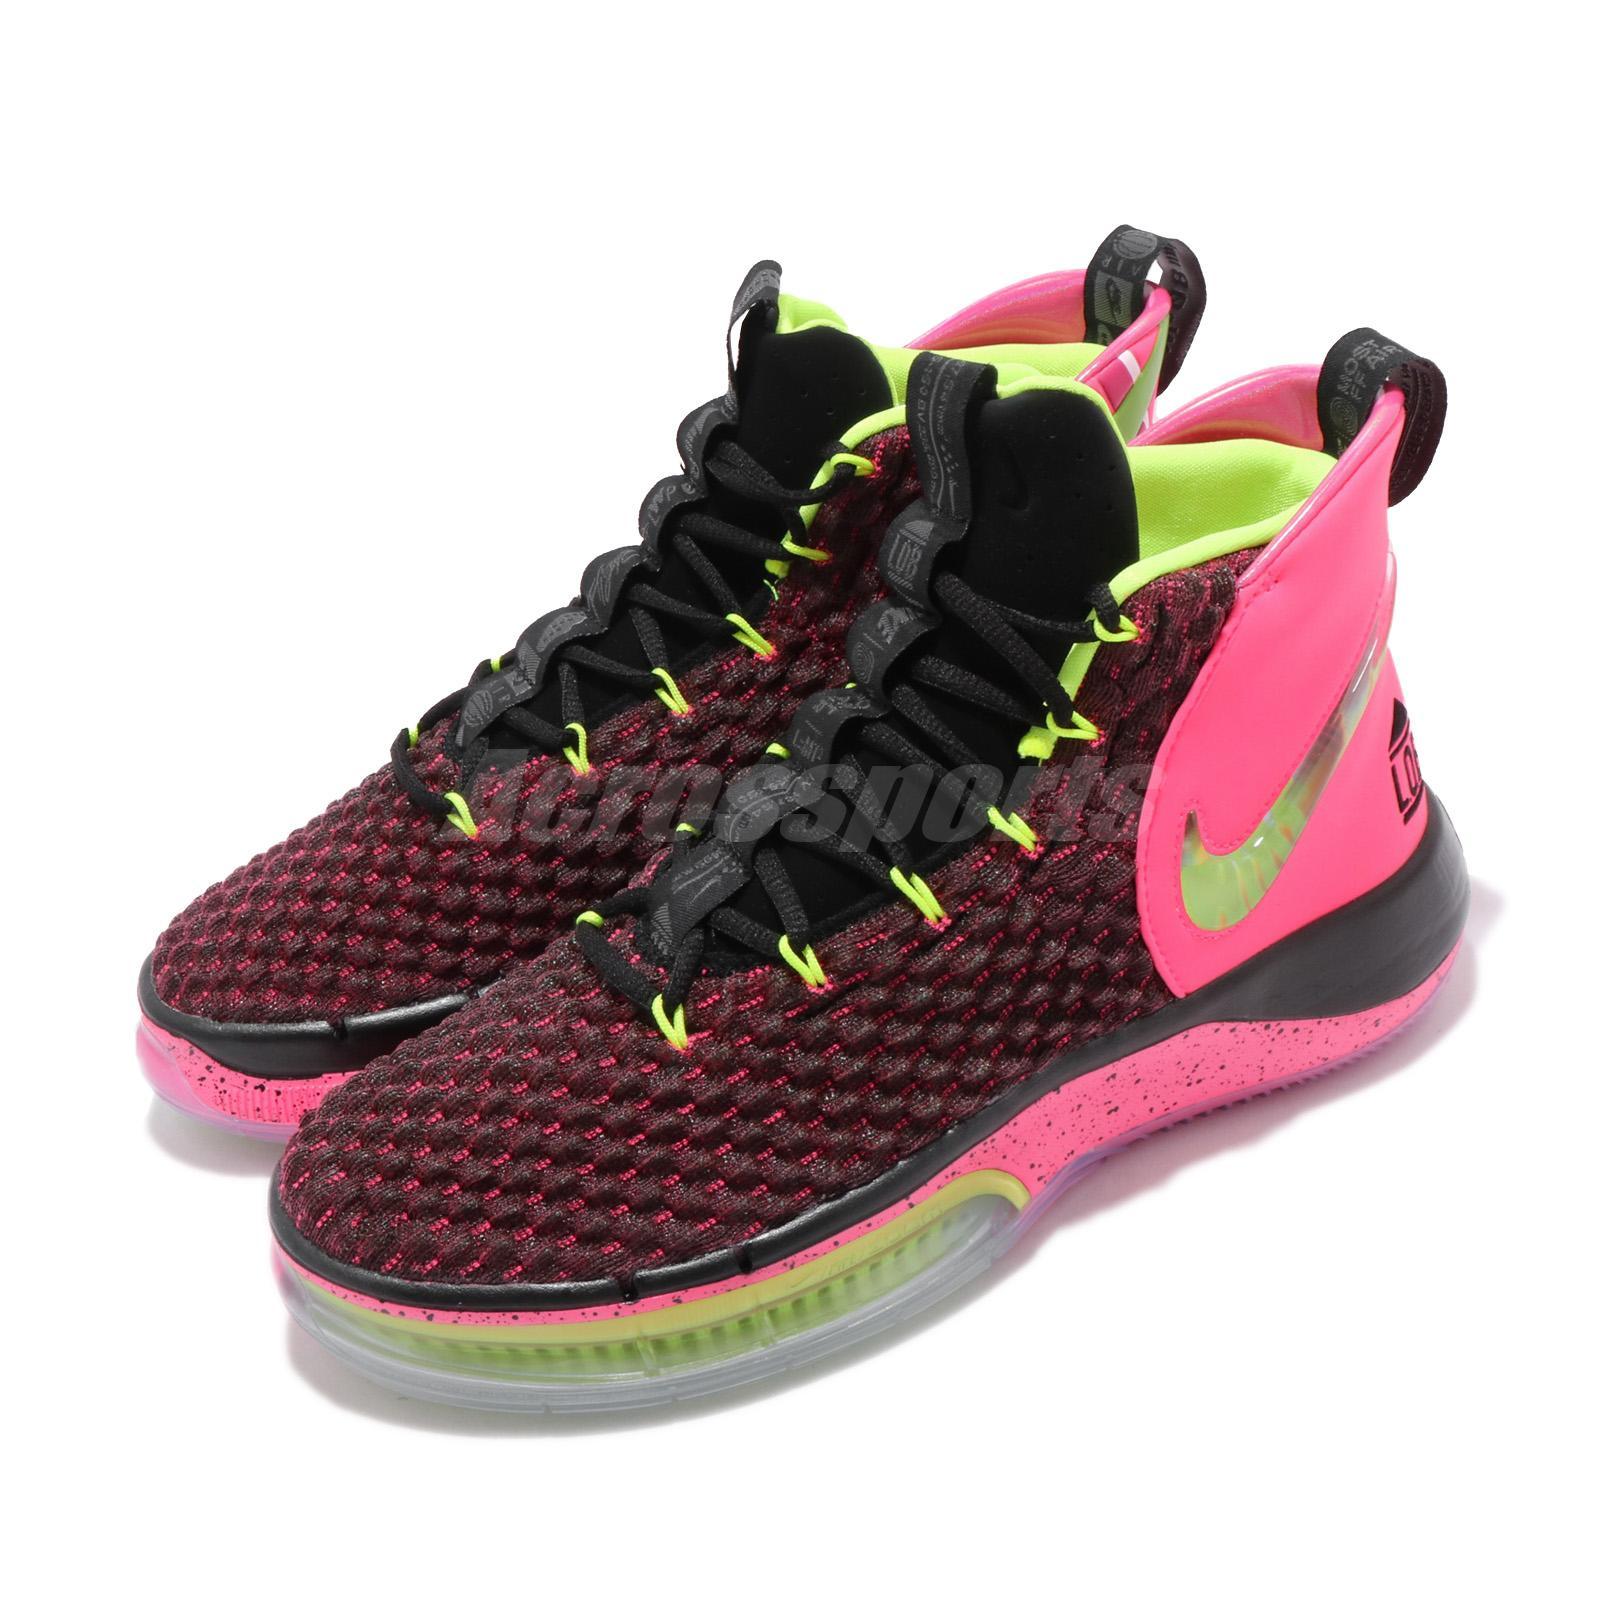 nike basketball shoes color pink